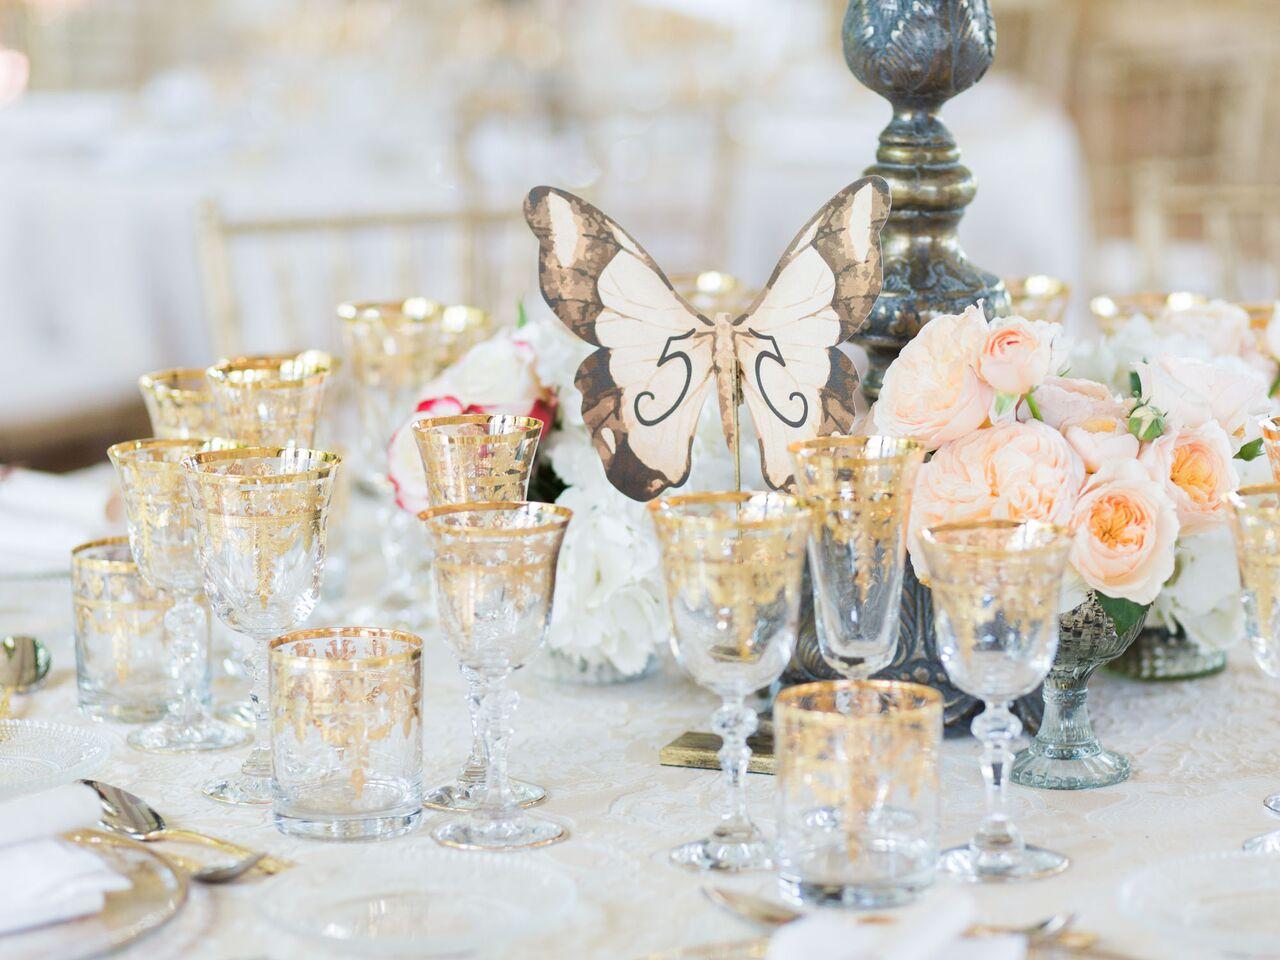 Si-Quiero-Wedding-Planner-By-Sira-Antequera-Paola-Pedro-5